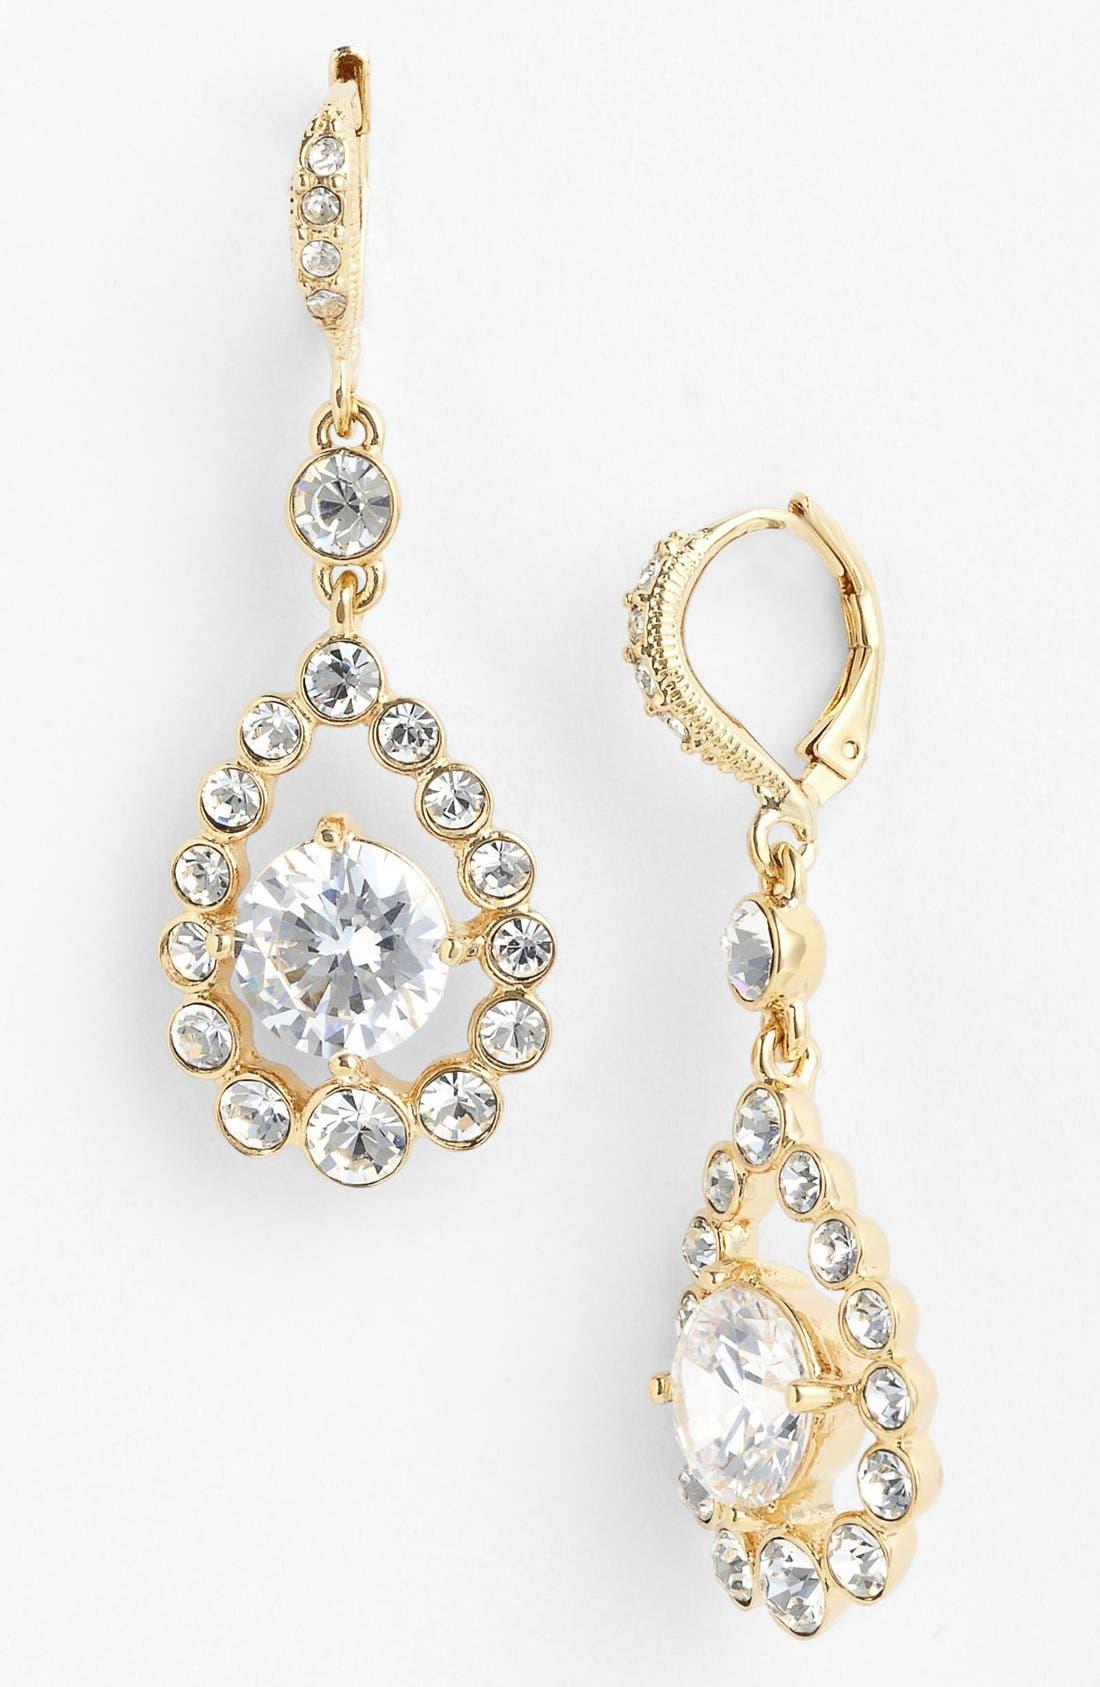 Main Image - Givenchy Teardrop Earrings